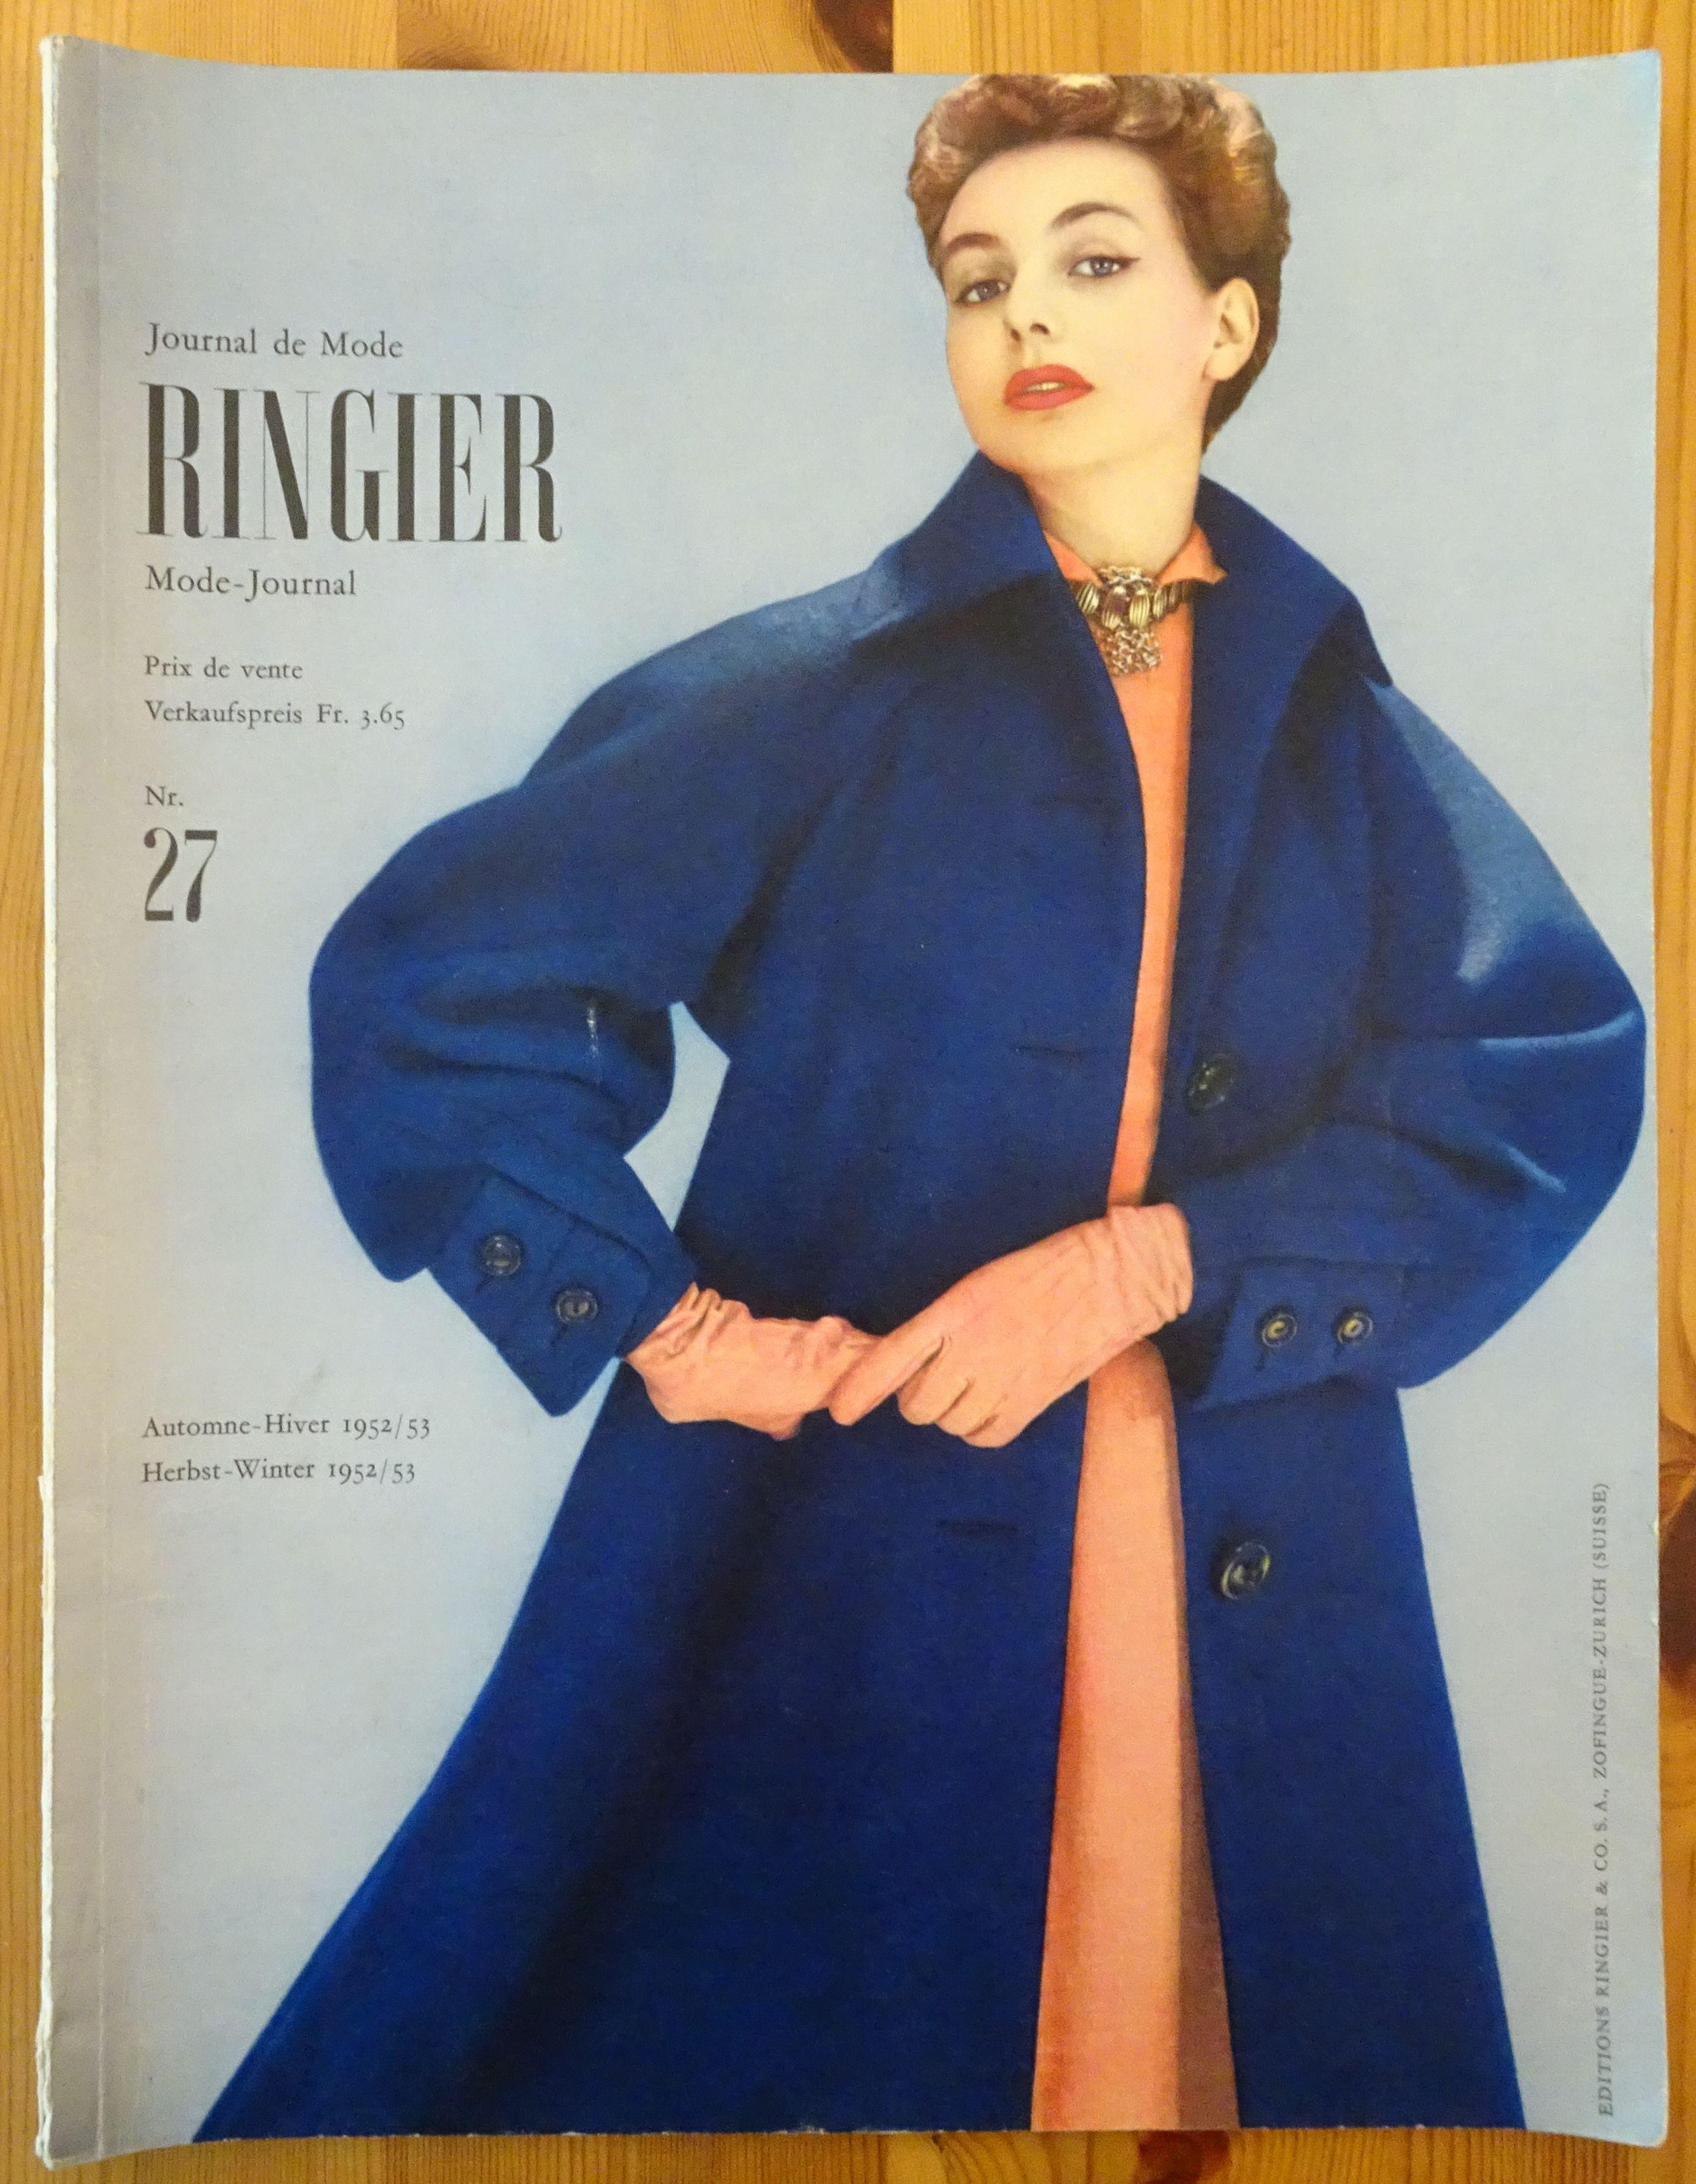 Ringier Journal de Mode Autumn/Winter 1952/53